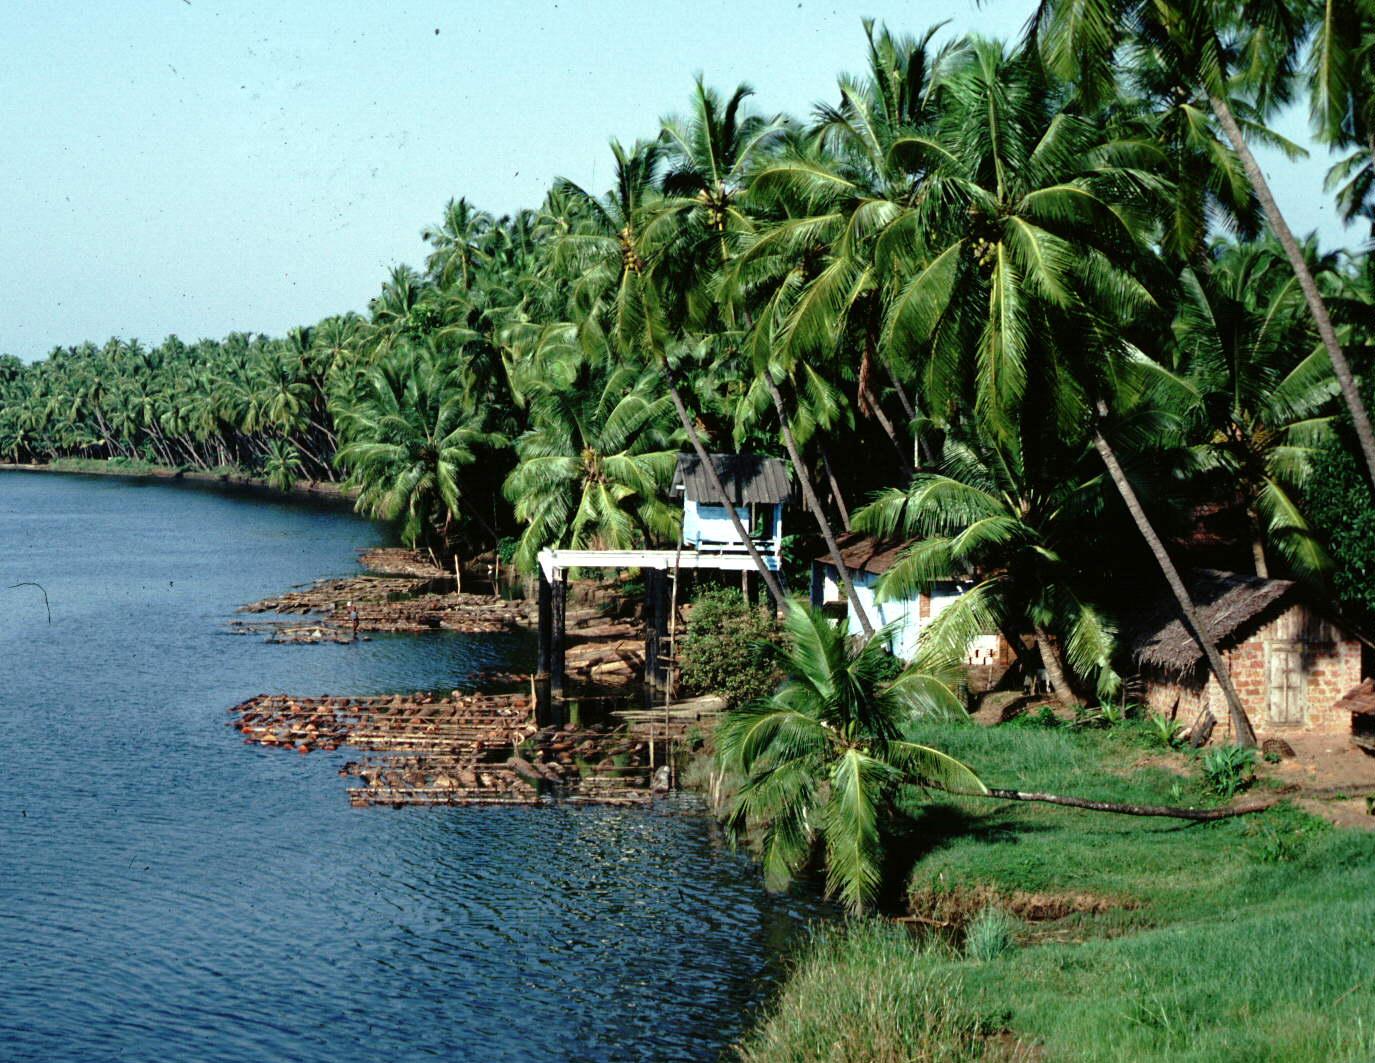 Munnar Destination That Must Visit In Kerala Shanayashah29